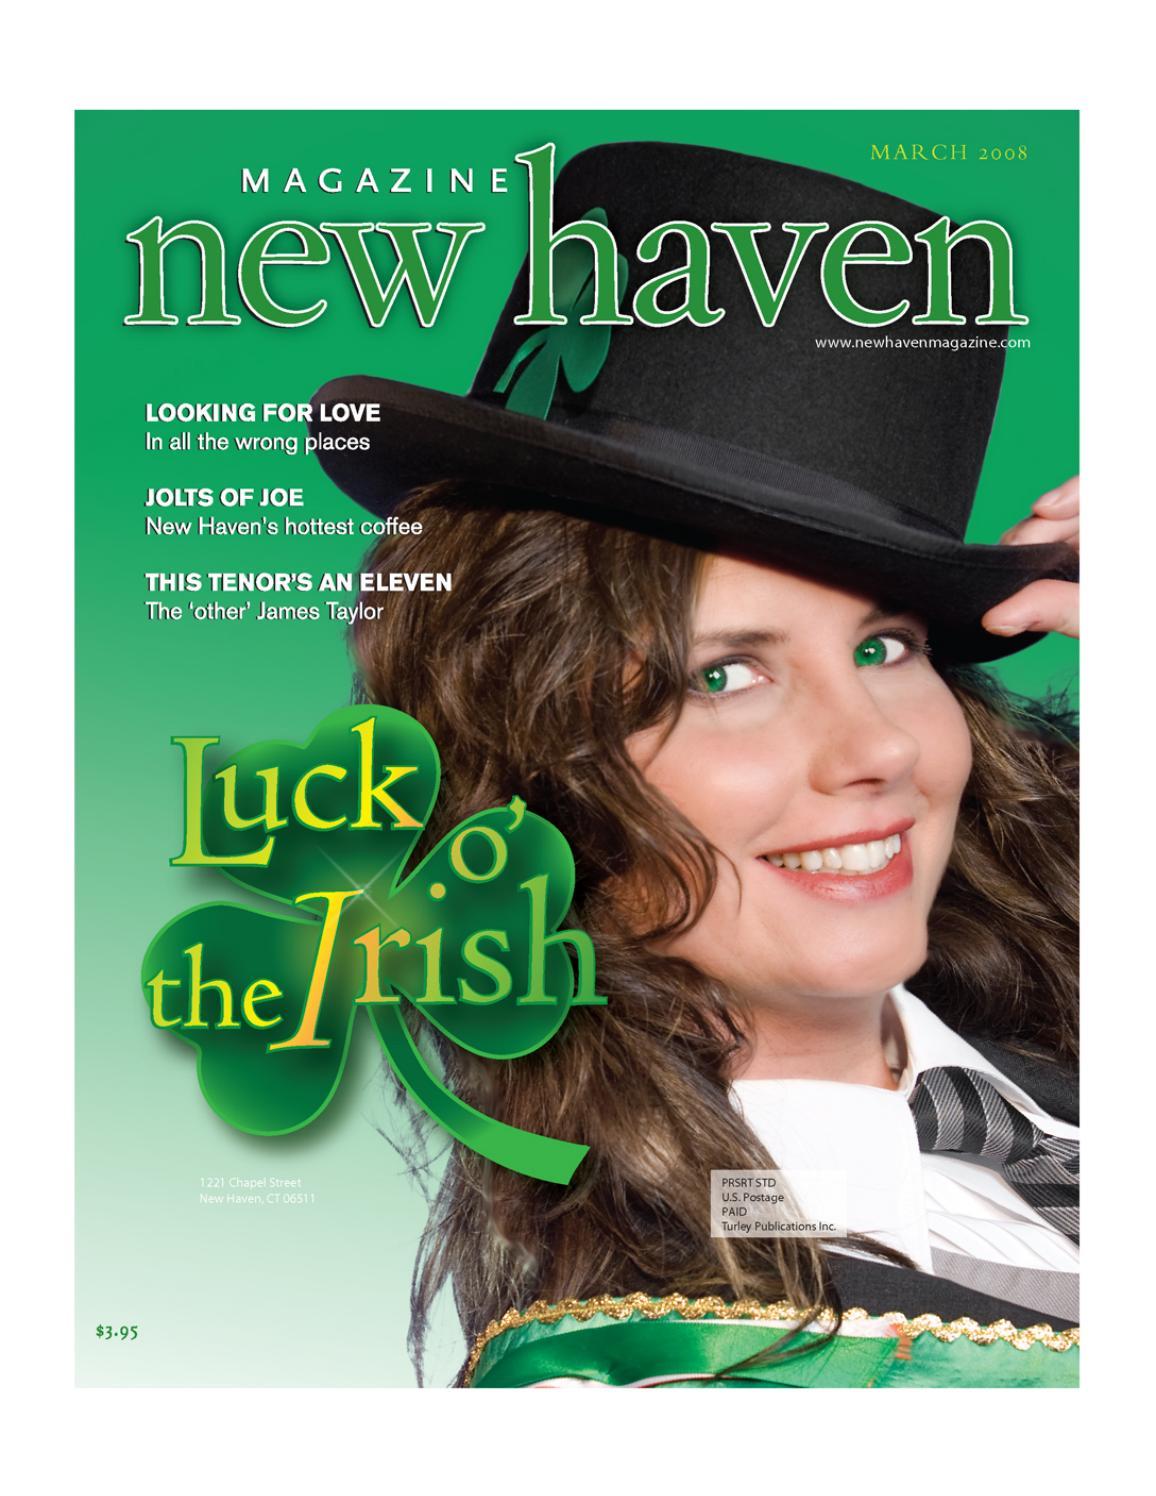 f576400da8 New Haven magazine March 2008 by Second Wind Media Ltd - issuu